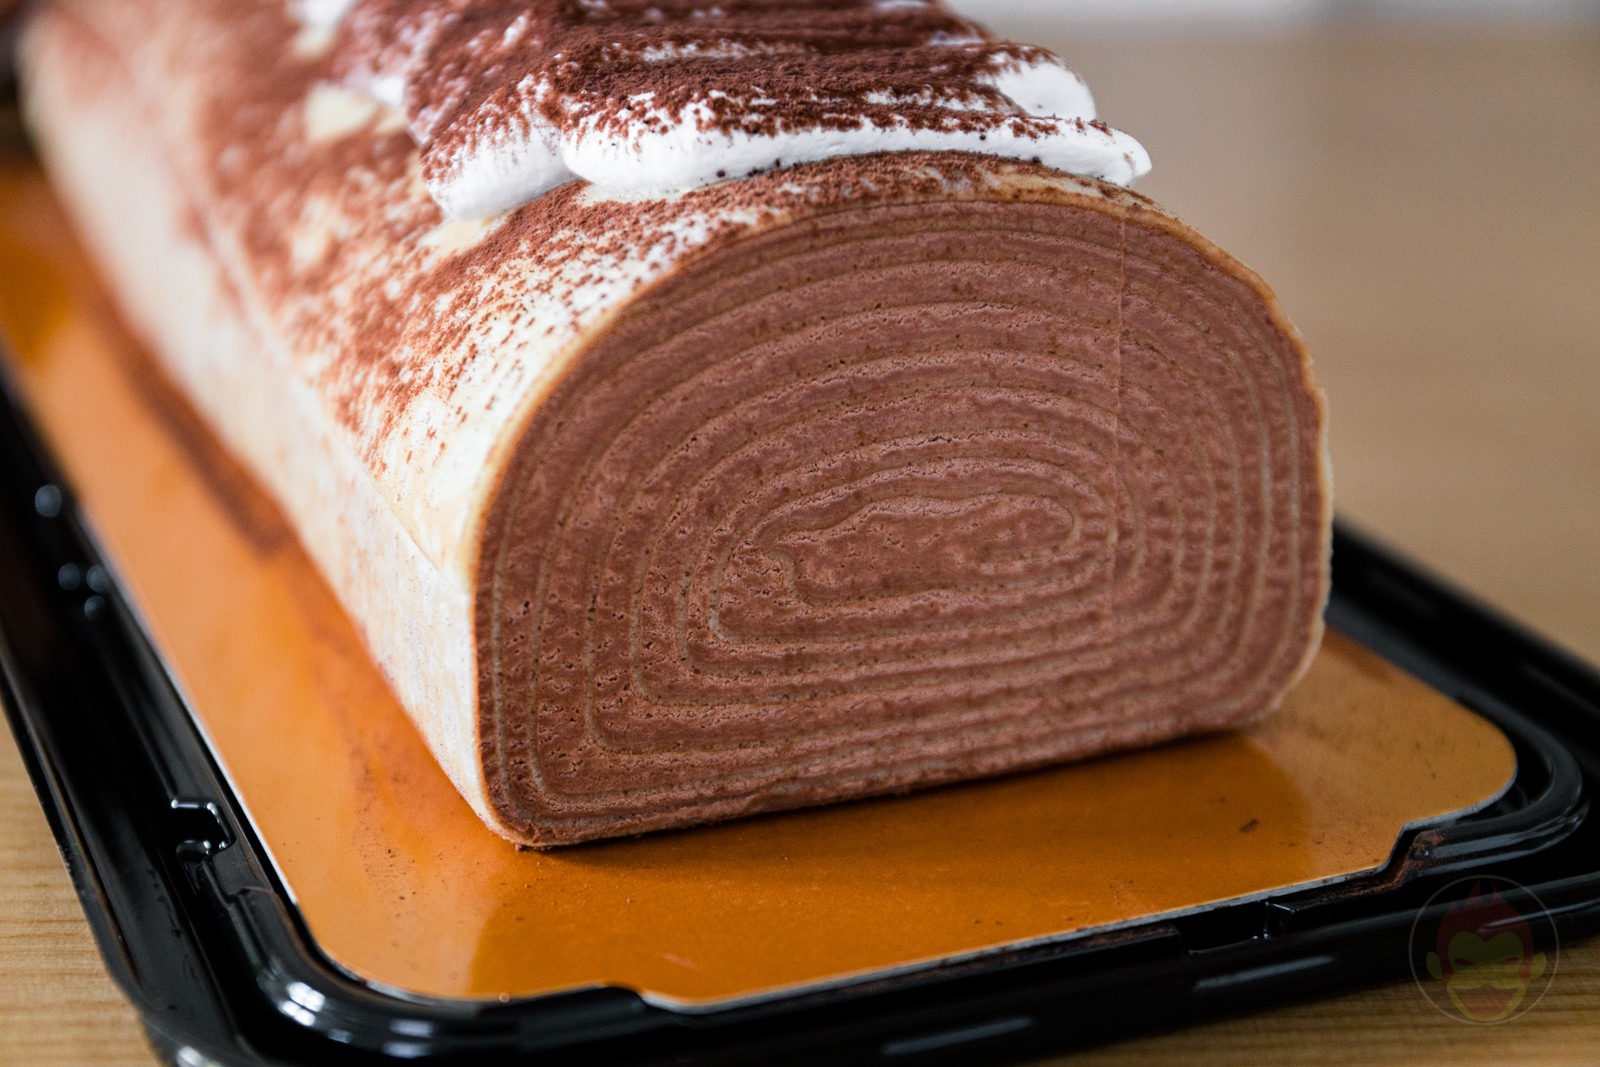 Chocolate Crape Roll Costco Dessert 09